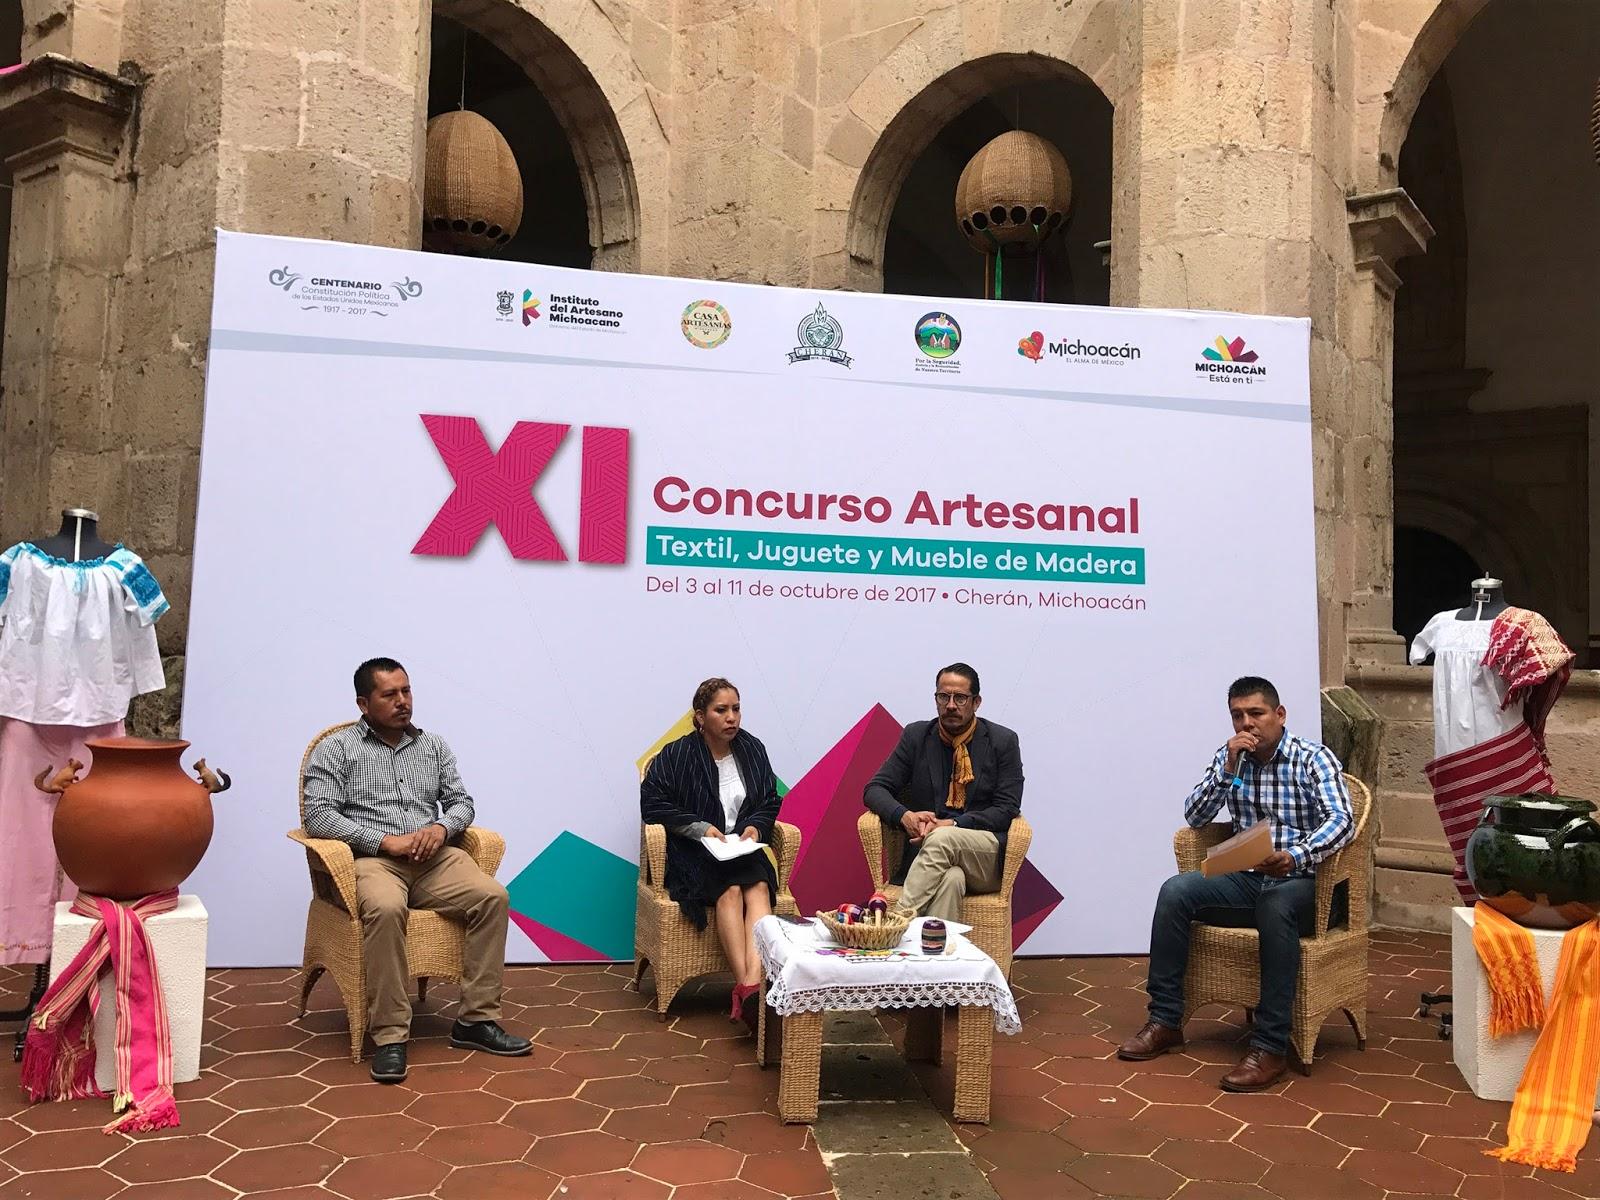 Invita Iam Al Concurso Artesanal De Textil Y Madera De Cher N Red113 # Muebles Michoacan